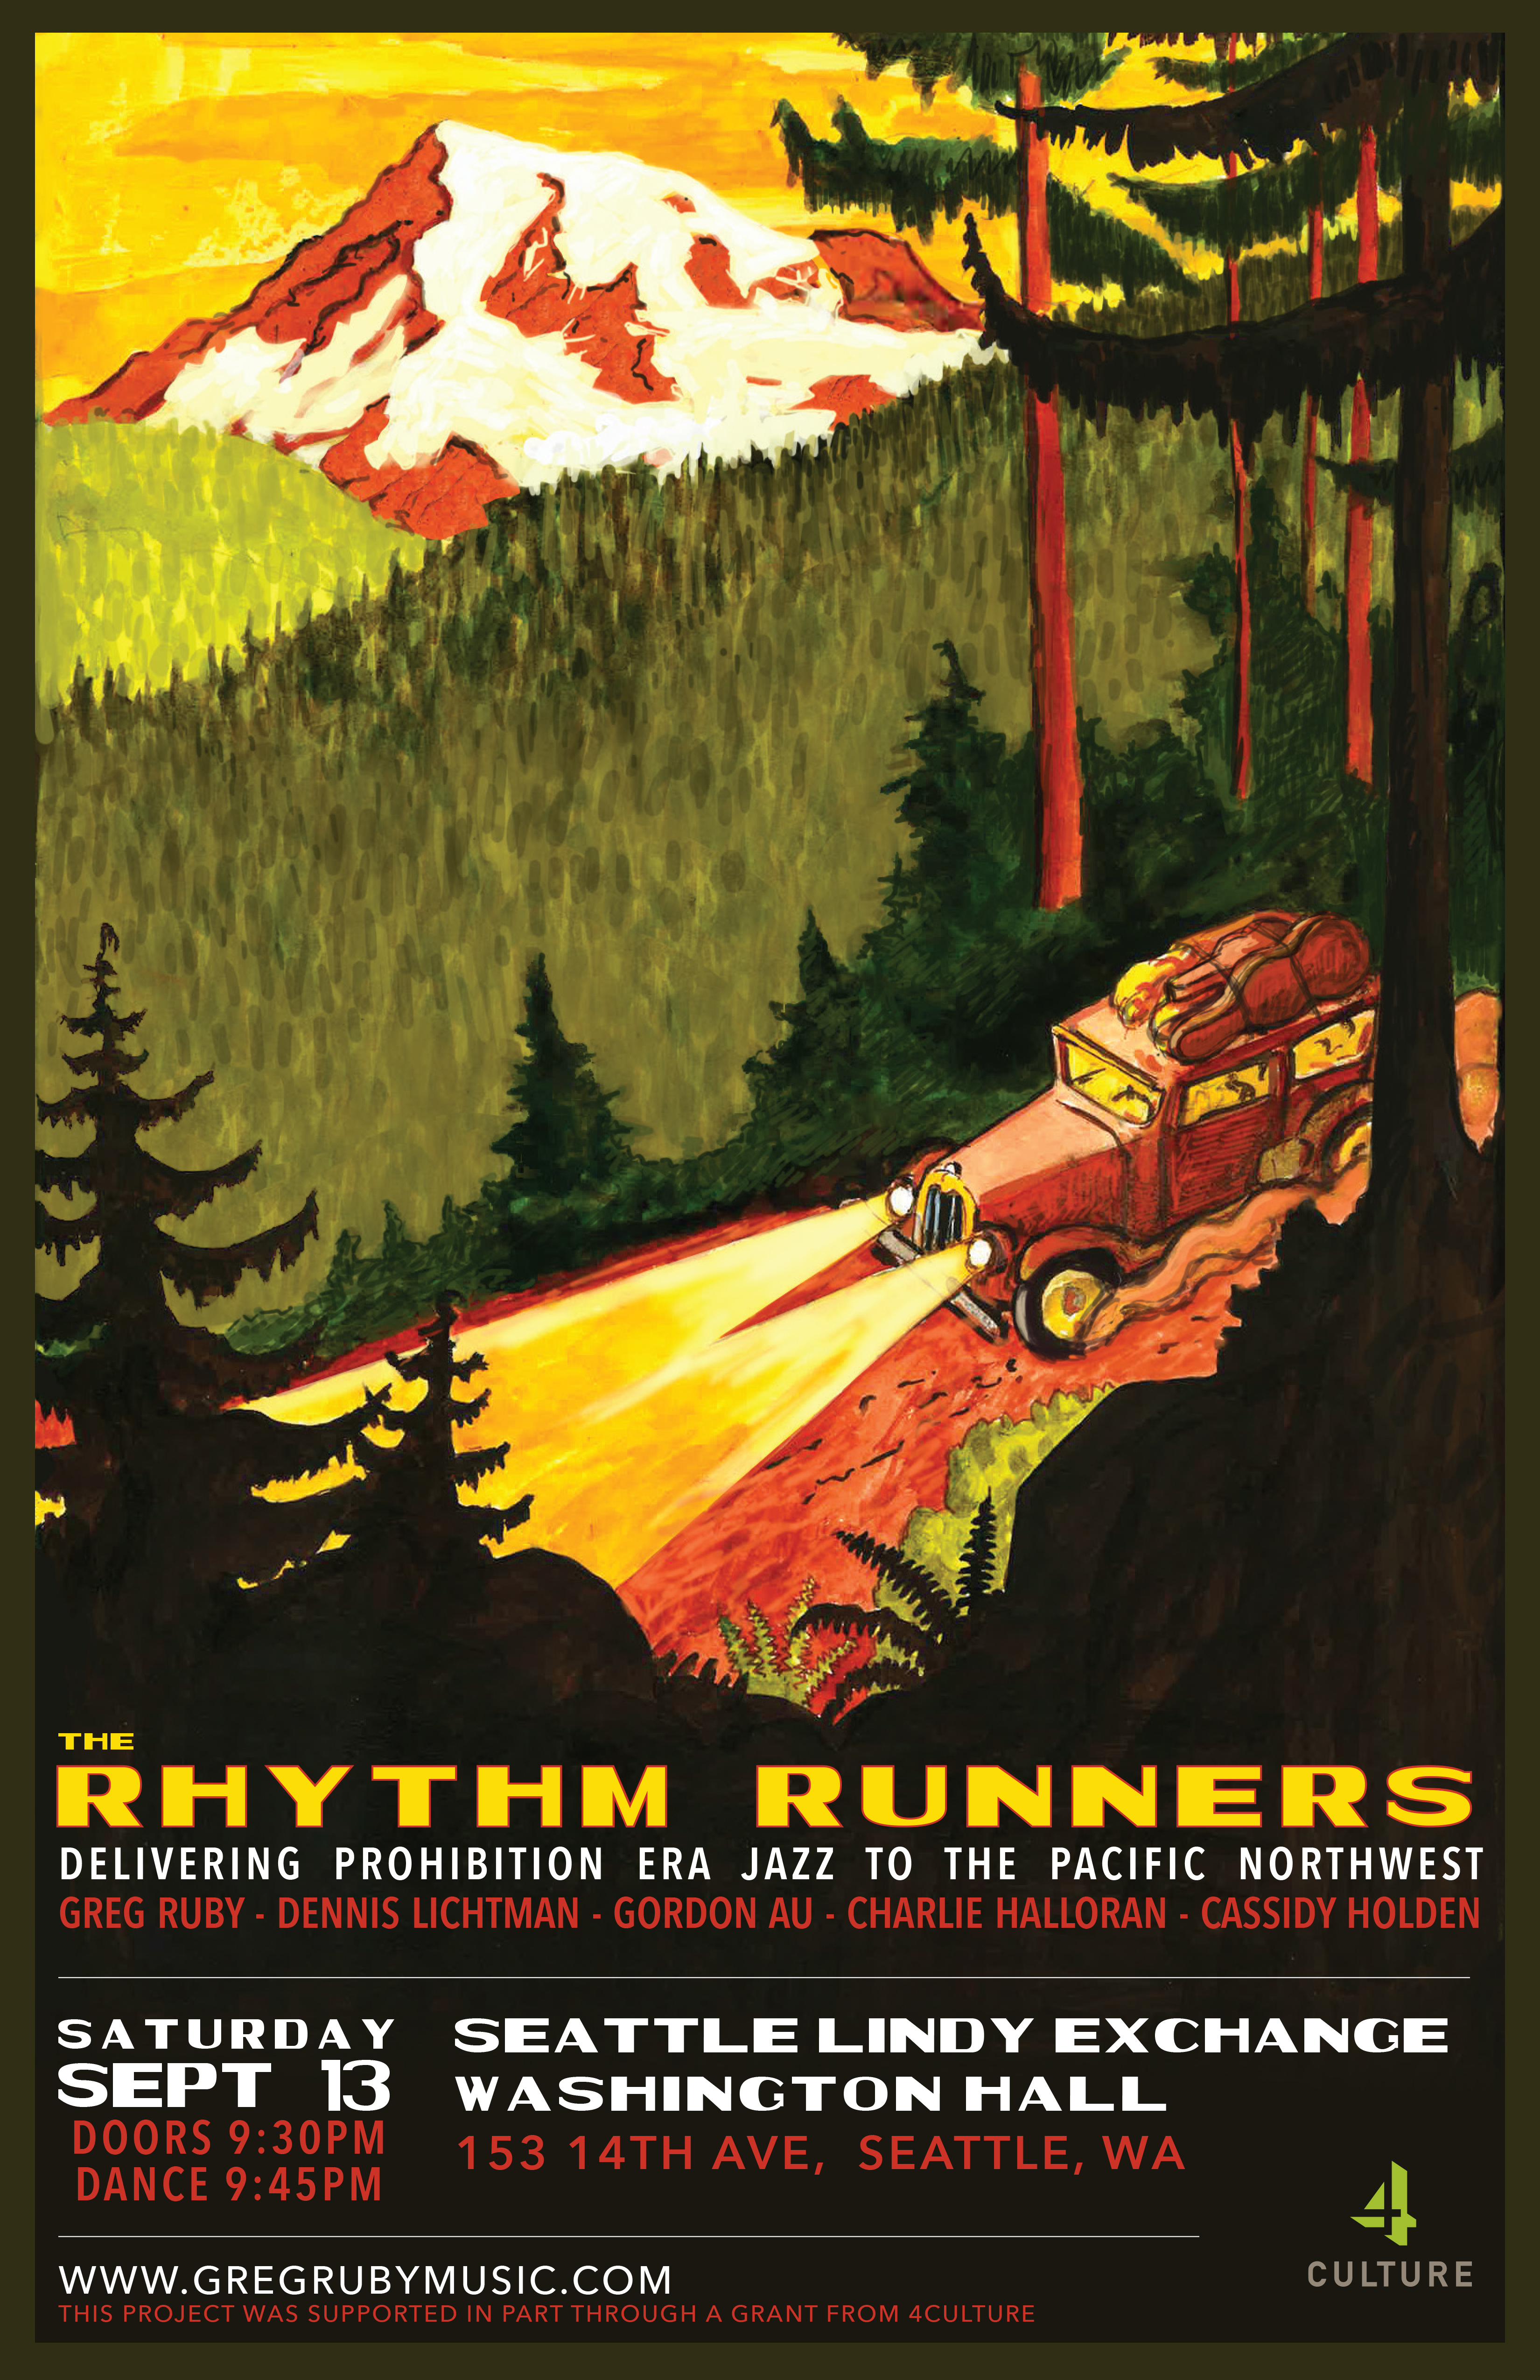 RhythmRunners_Poster_SEALindy1